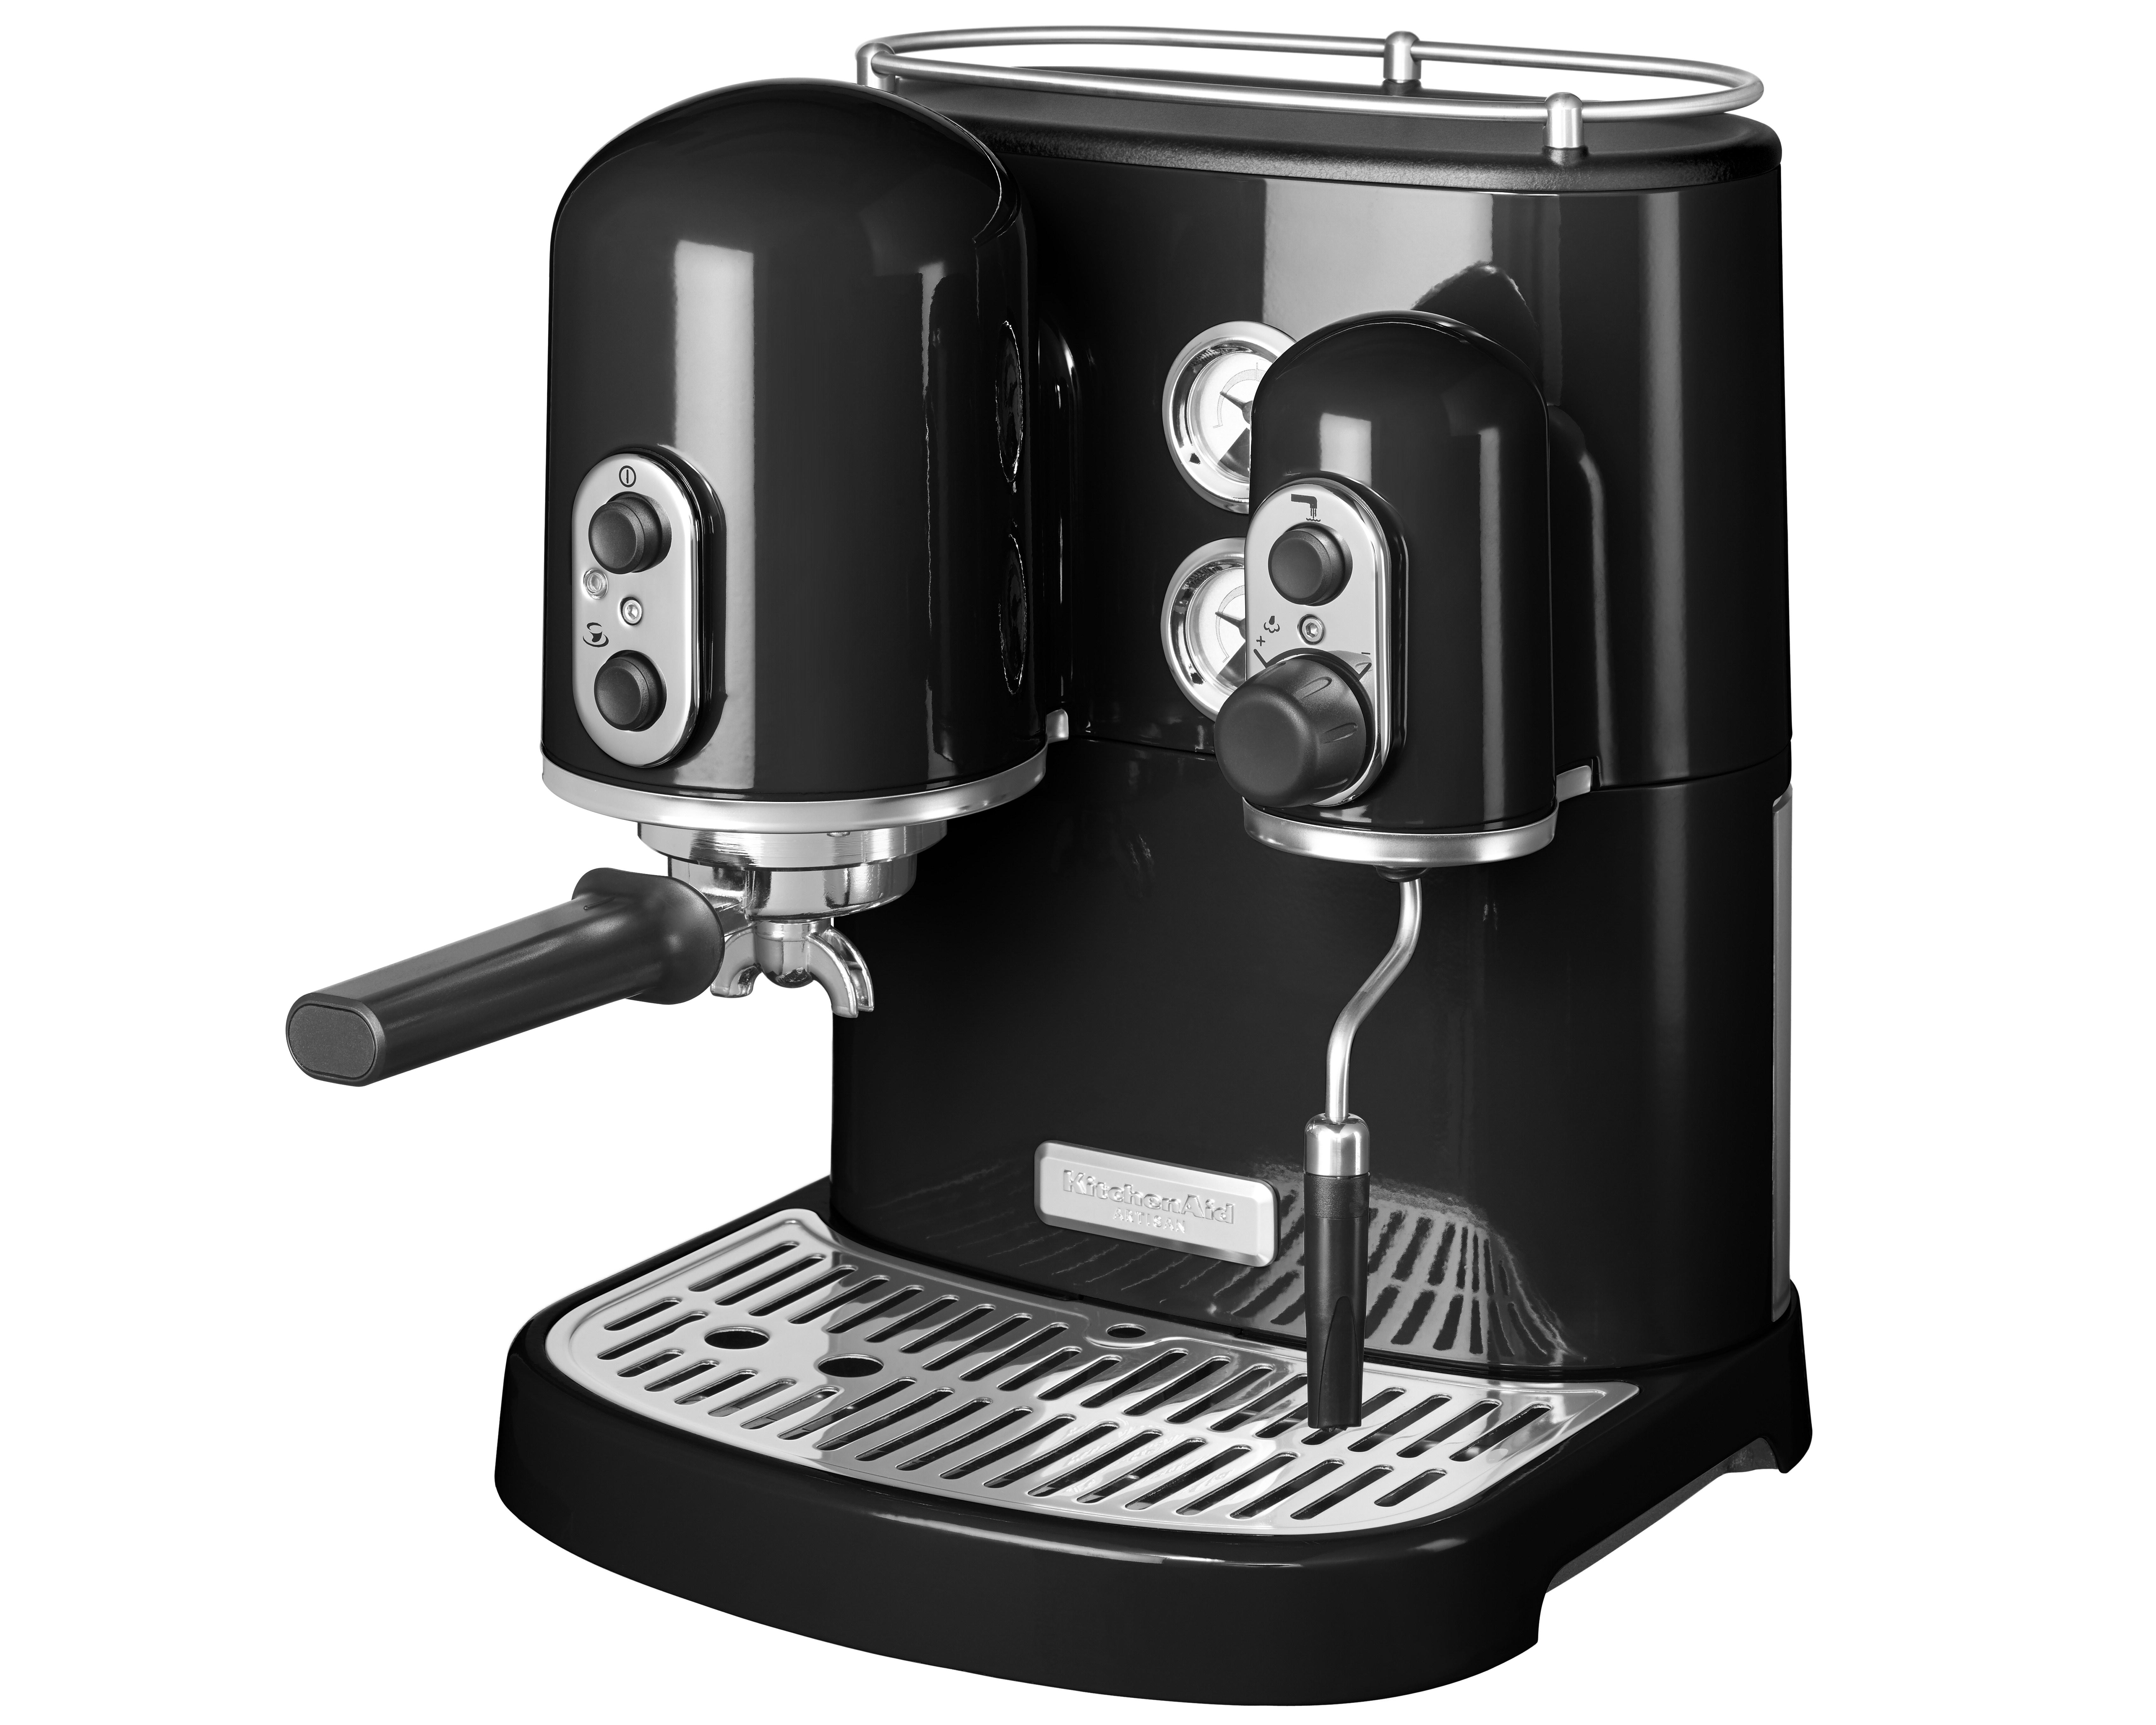 KitchenAid Artisan Espressomaskin Svart